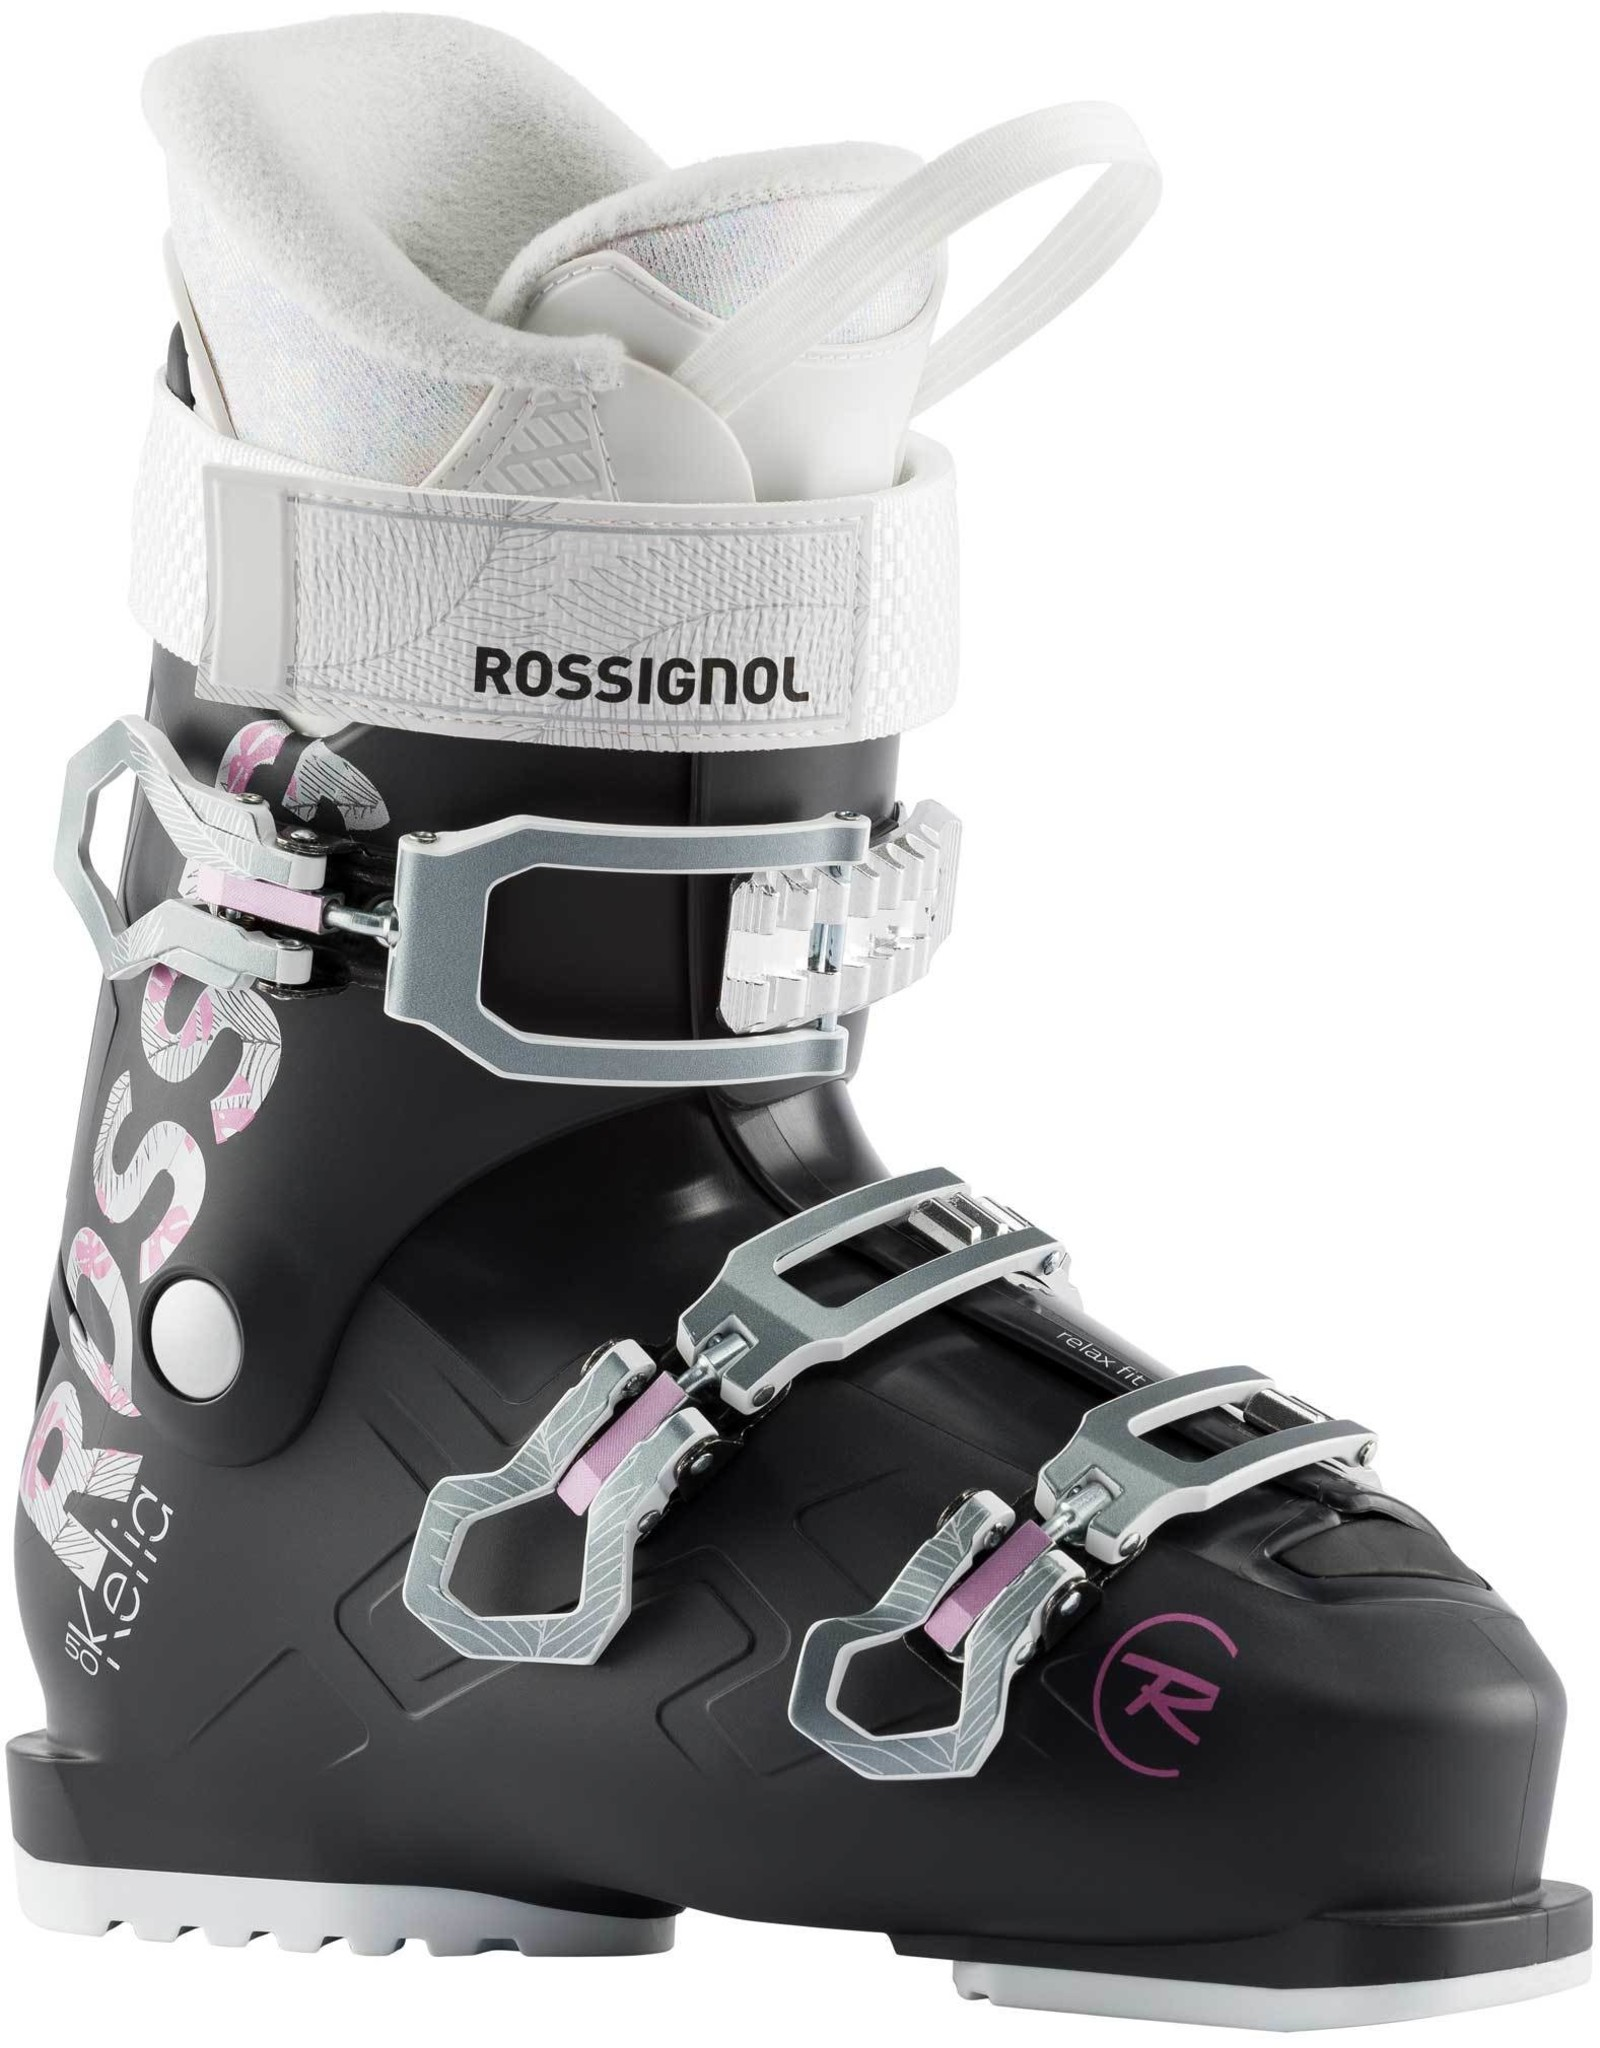 Rossignol KELIA 50 - SOFT BLACK